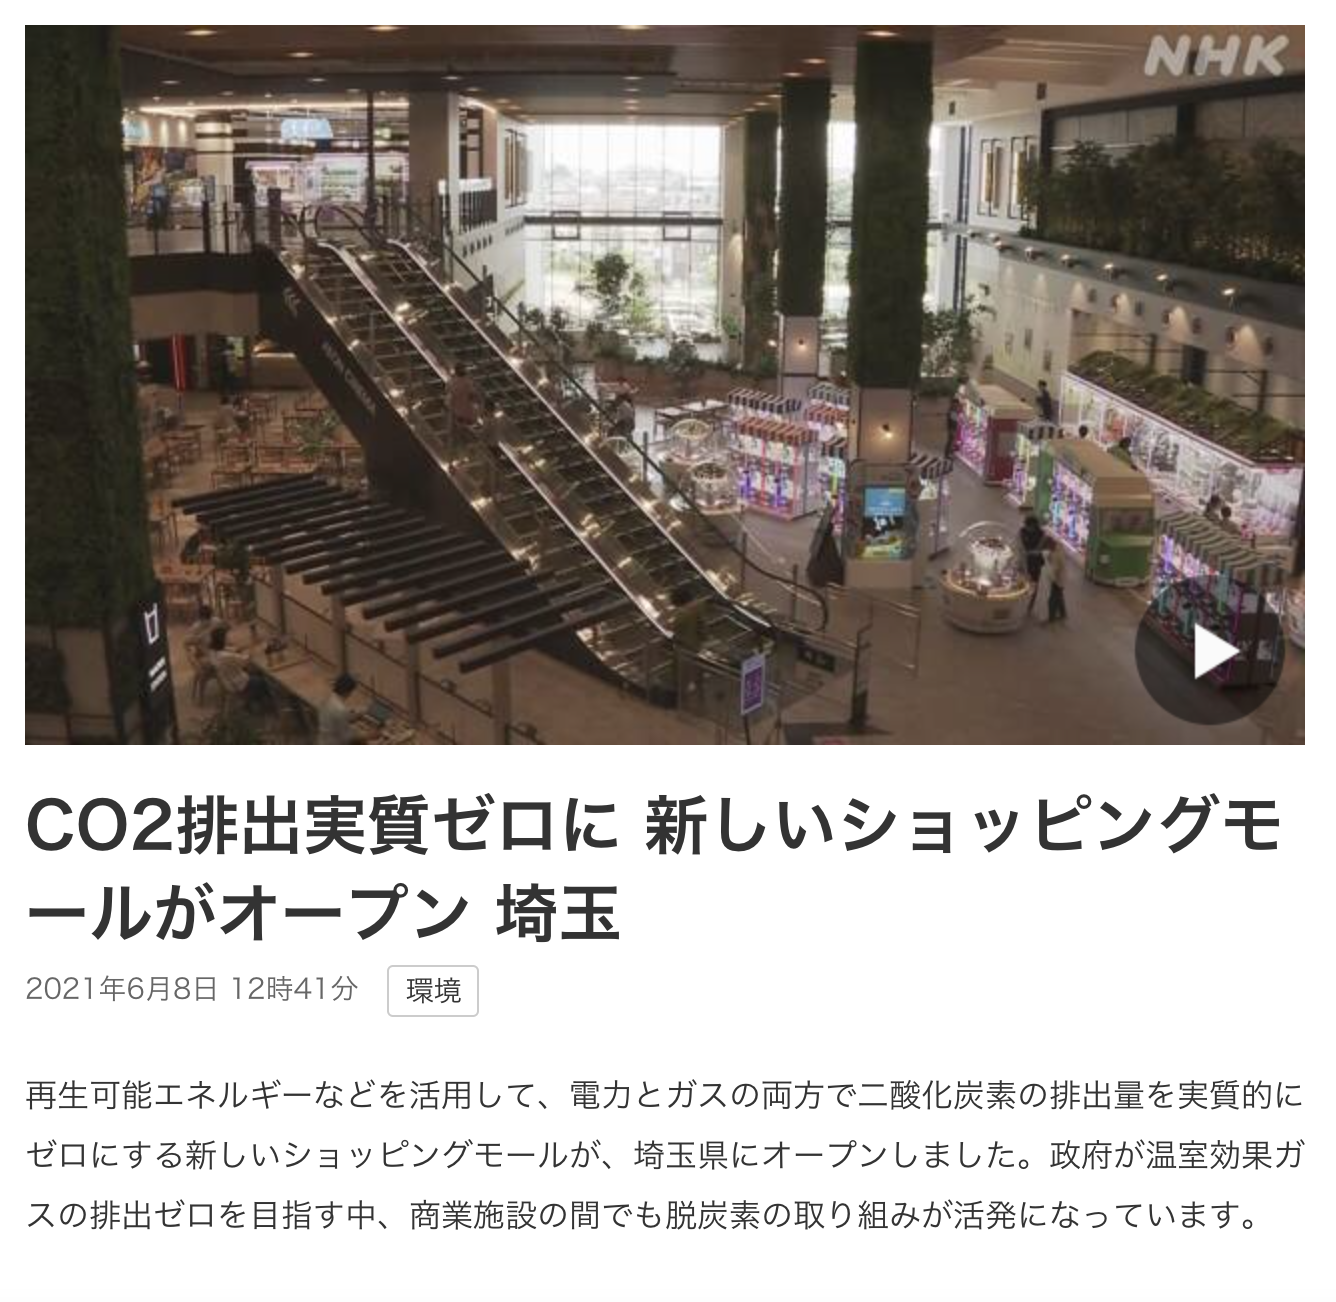 CO2排出実質ゼロに 新しいショッピングモールがオープン